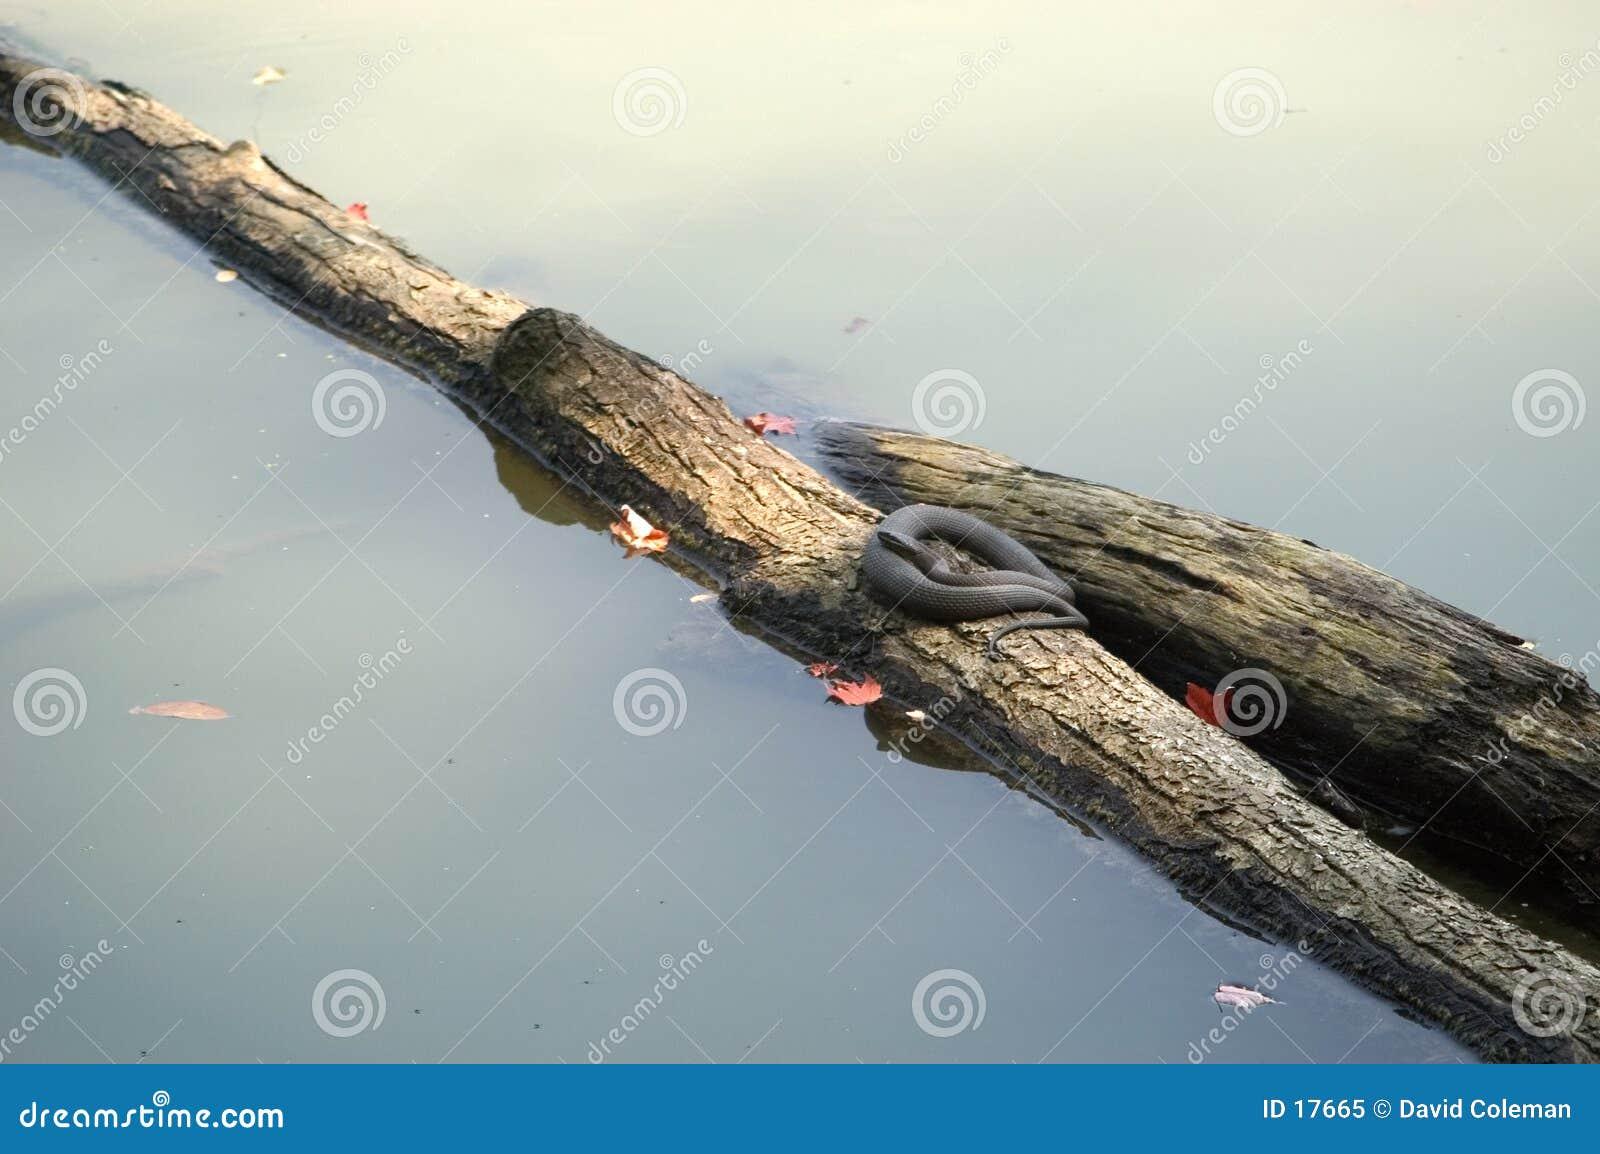 Sunning on a log